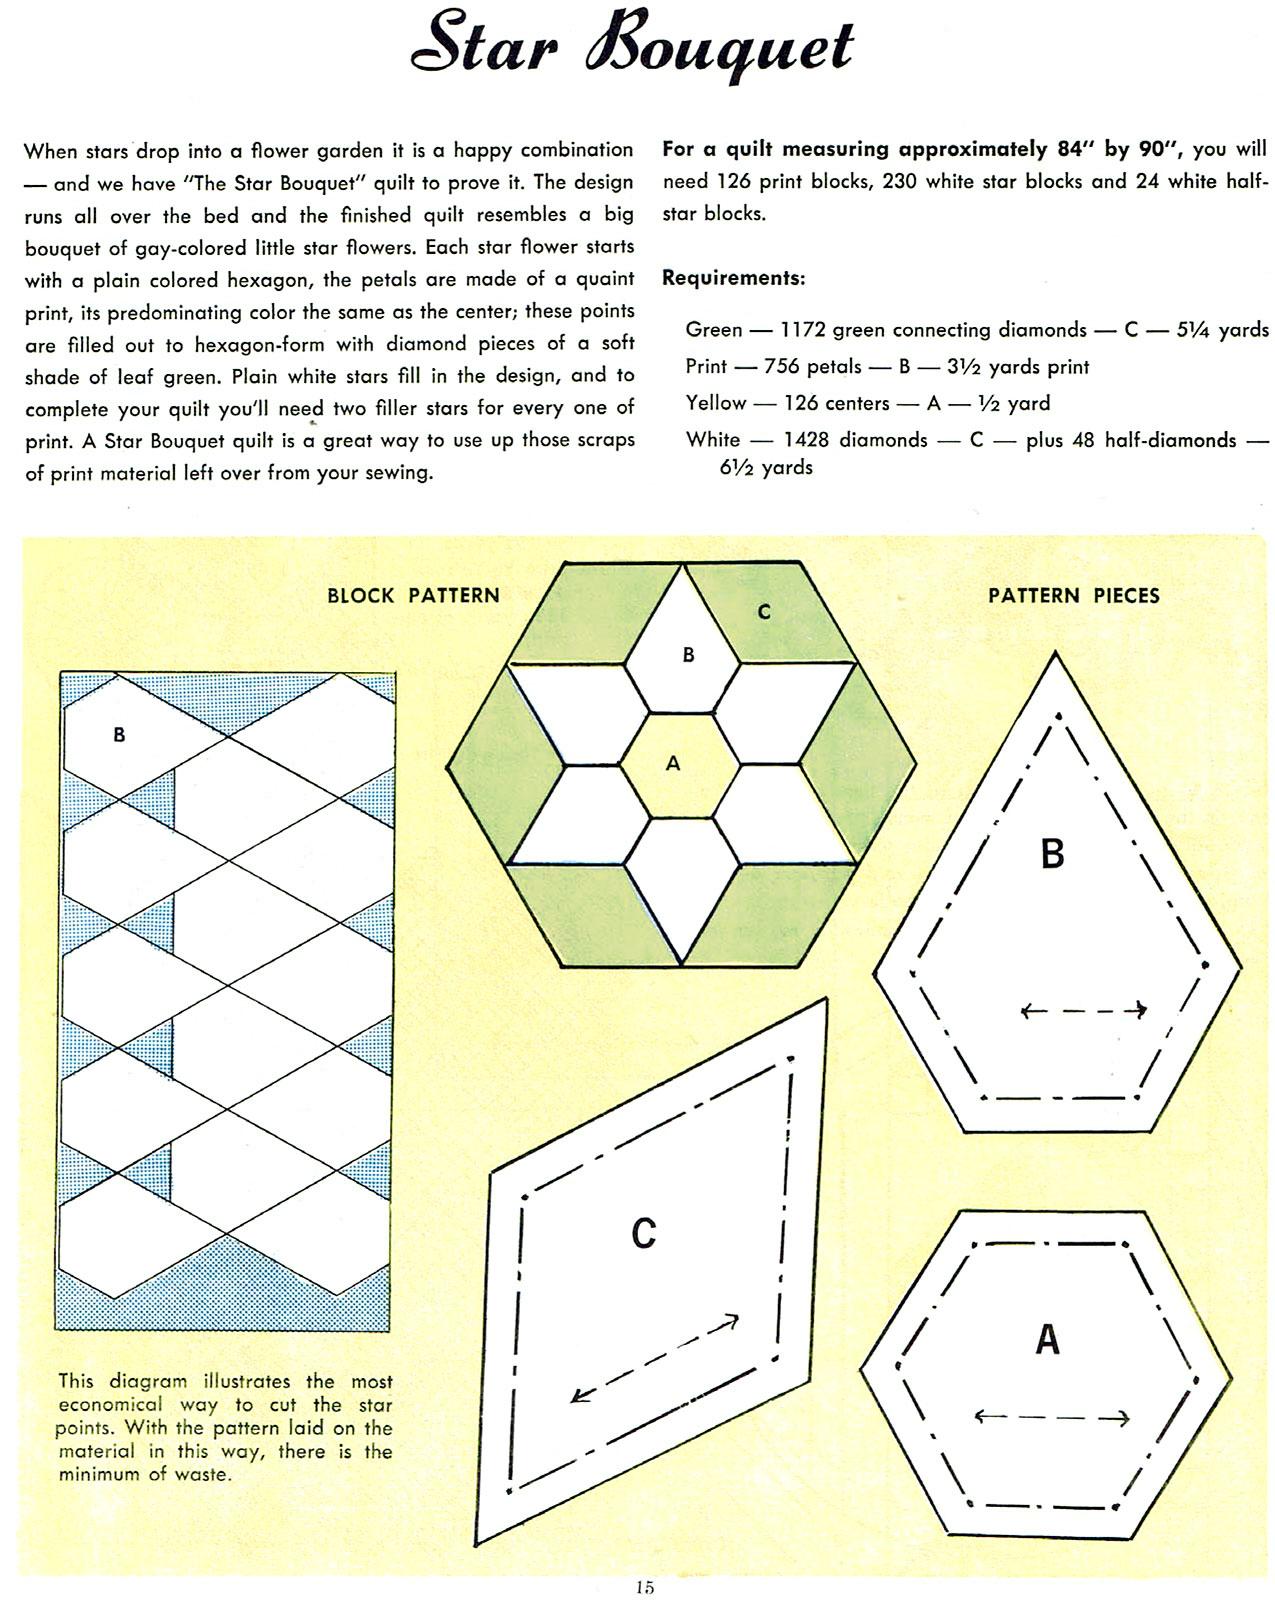 http://qisforquilter.com/wp-content/uploads/2012/11/Sixteen-Blue-Ribbon-Quilts-17.jpg